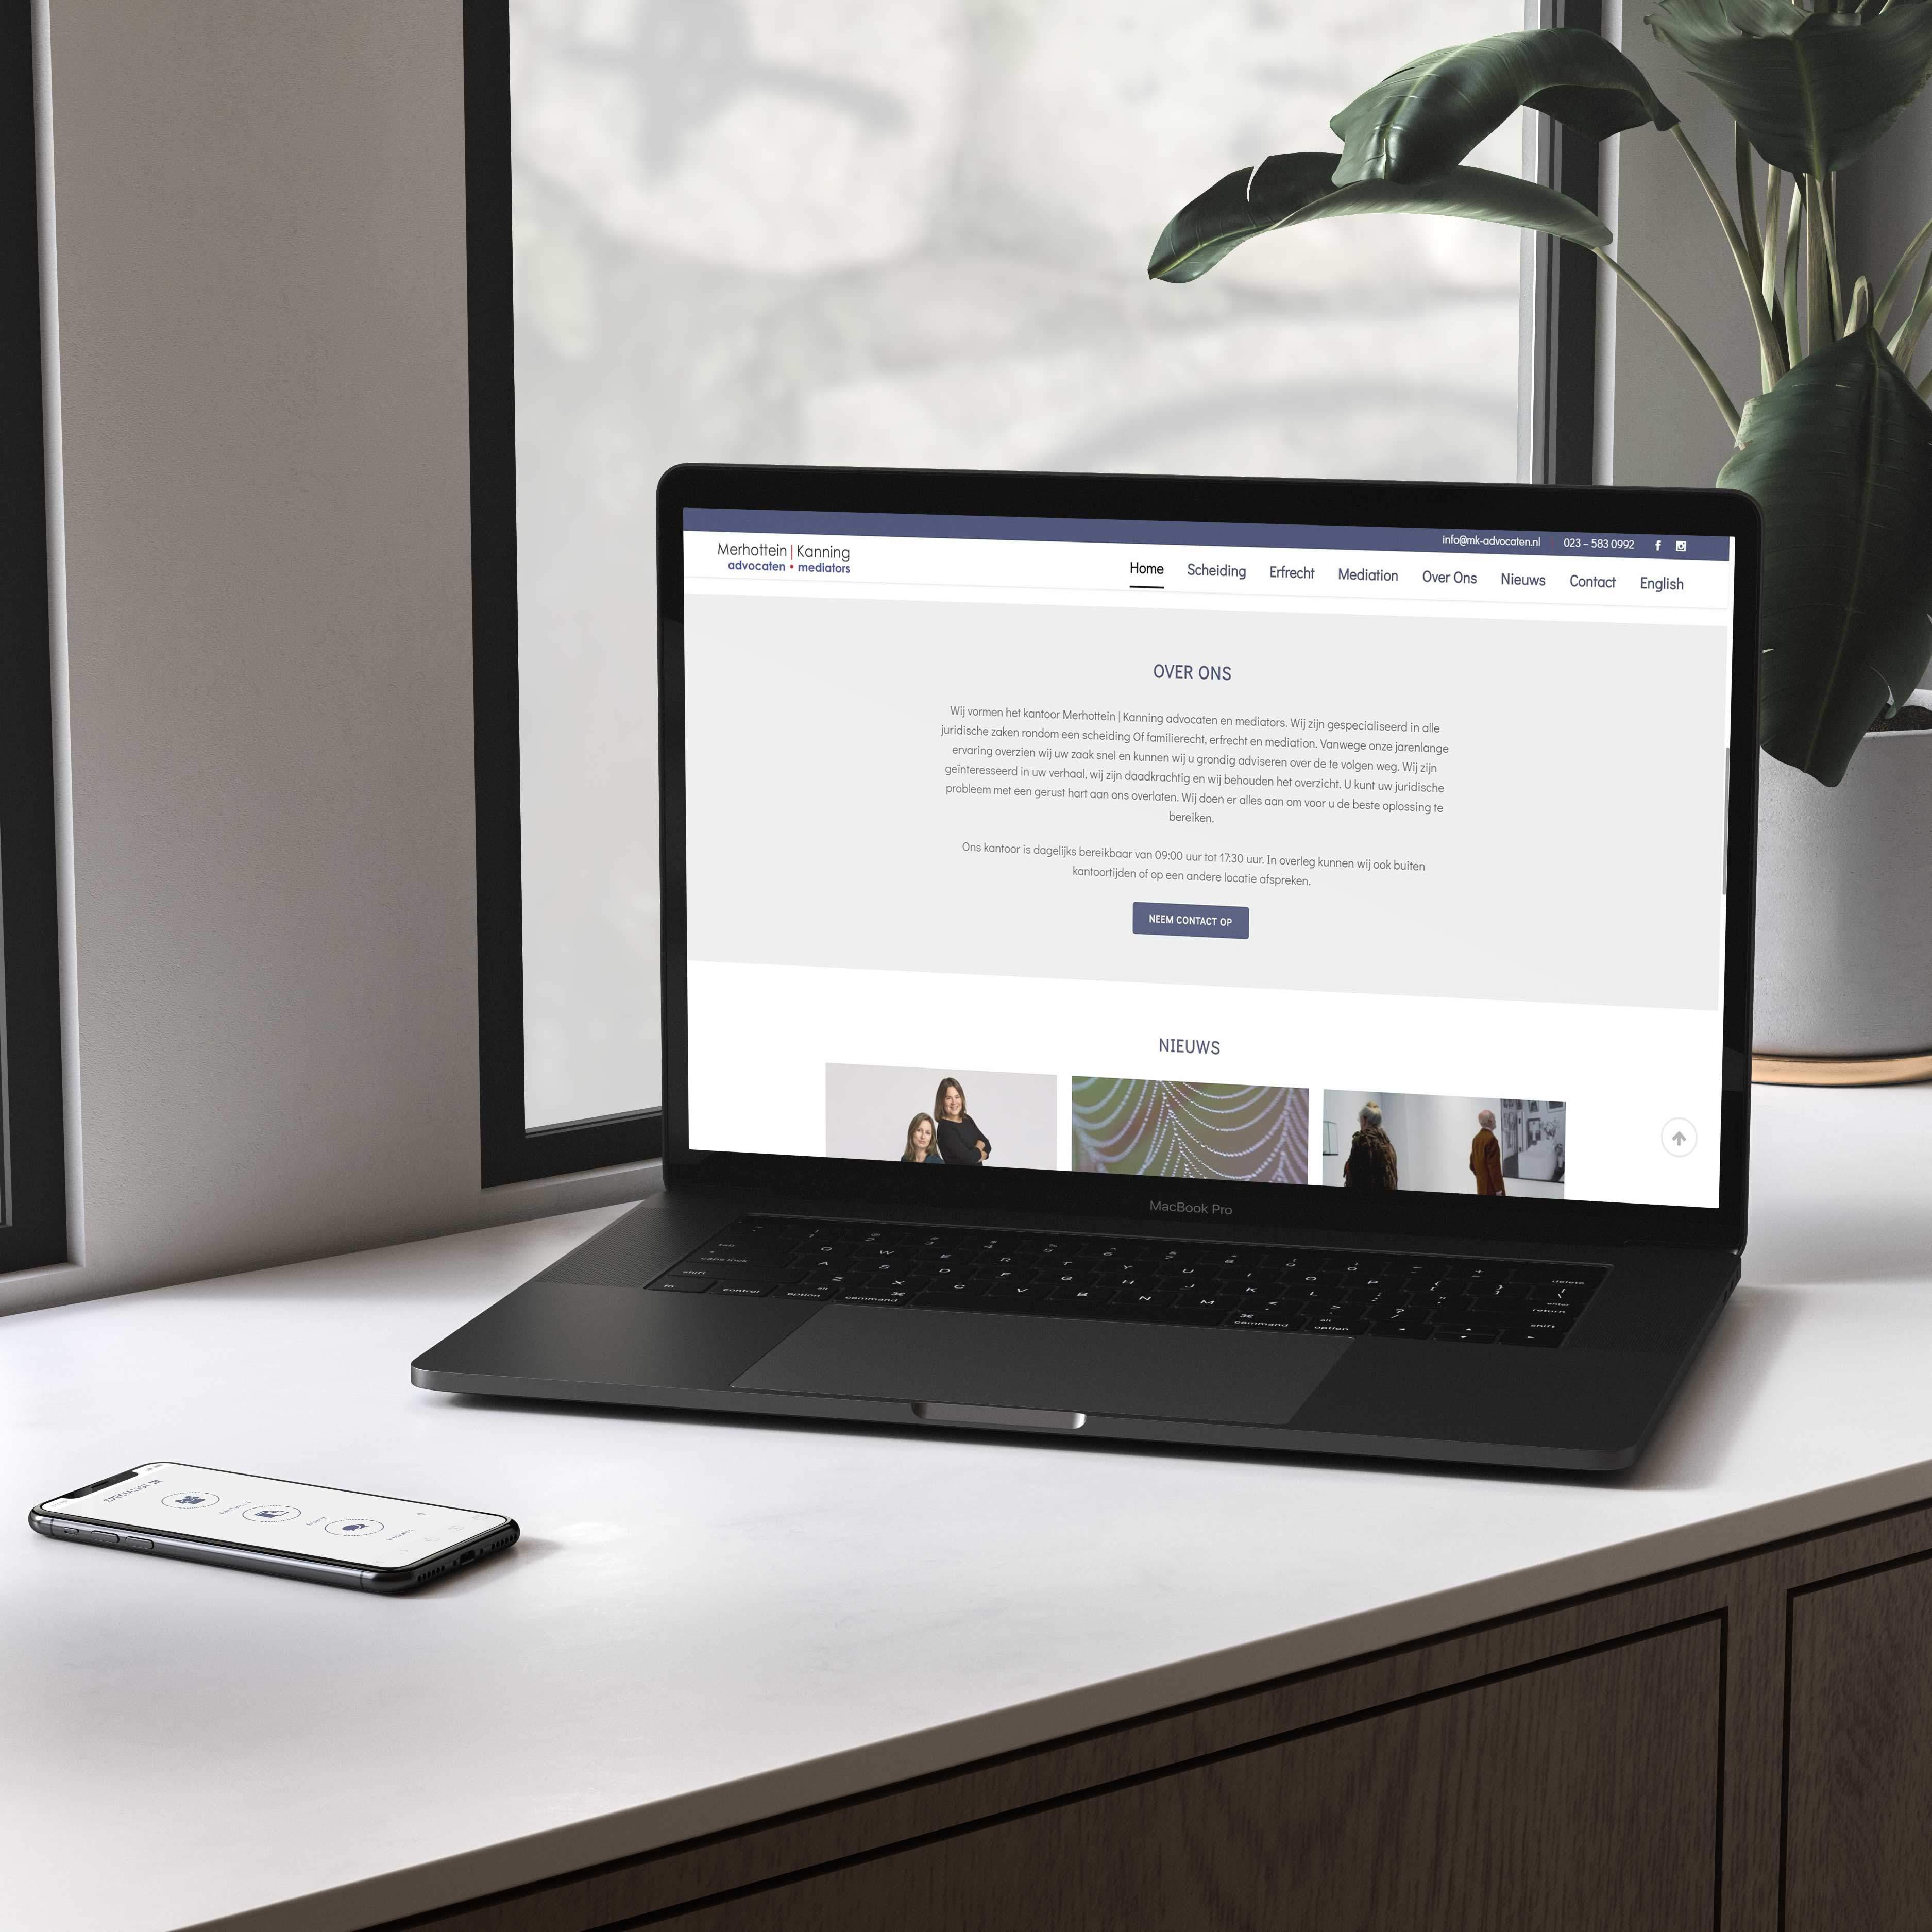 mk-advocaten-online-marketing-bureau-webdevelopment-haarlem-made-marketing-2